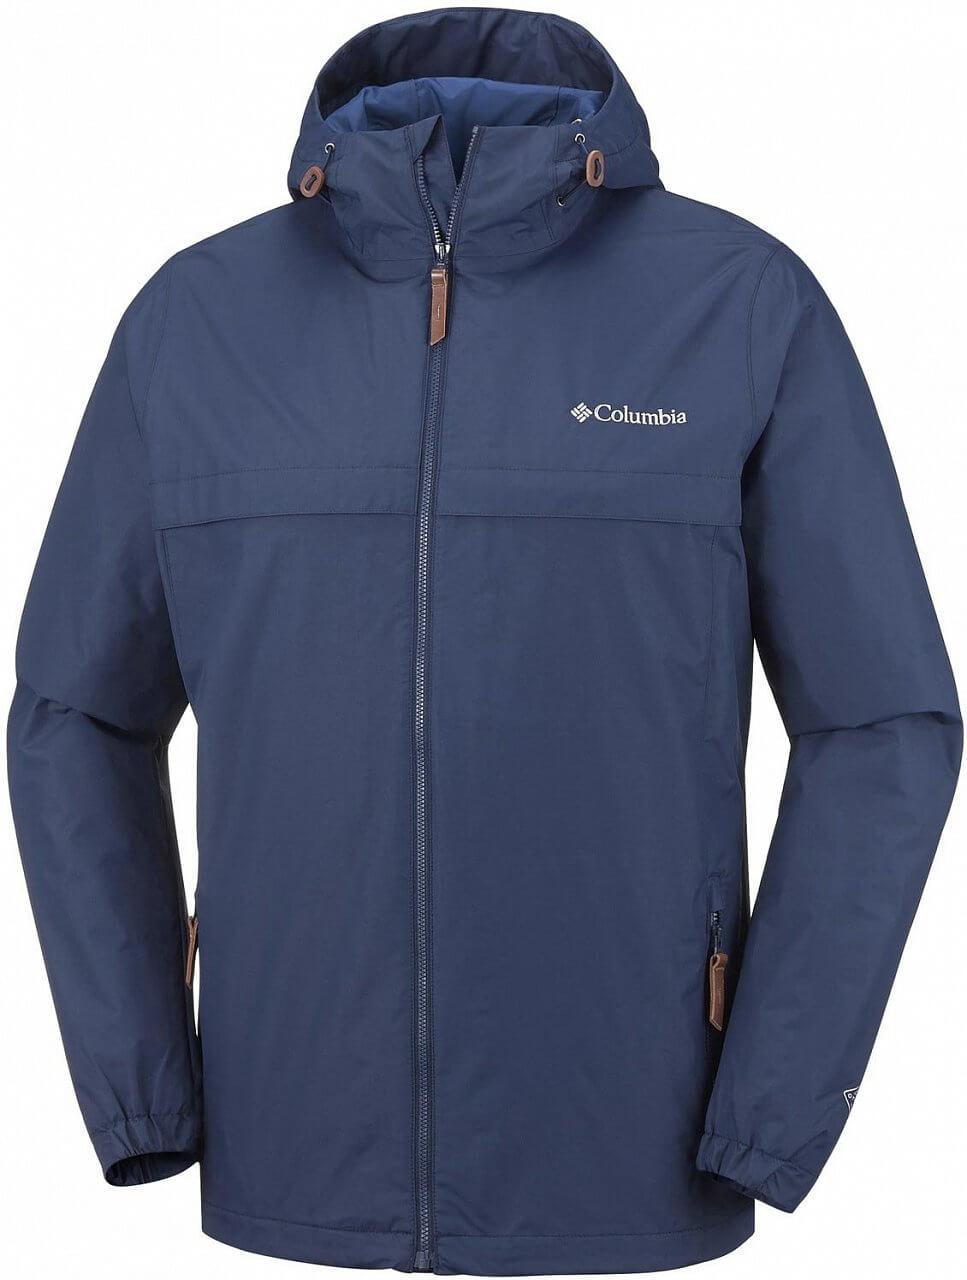 6d02eef695939 Pánska outdoorová bunda Columbia Jones Ridge Jacket